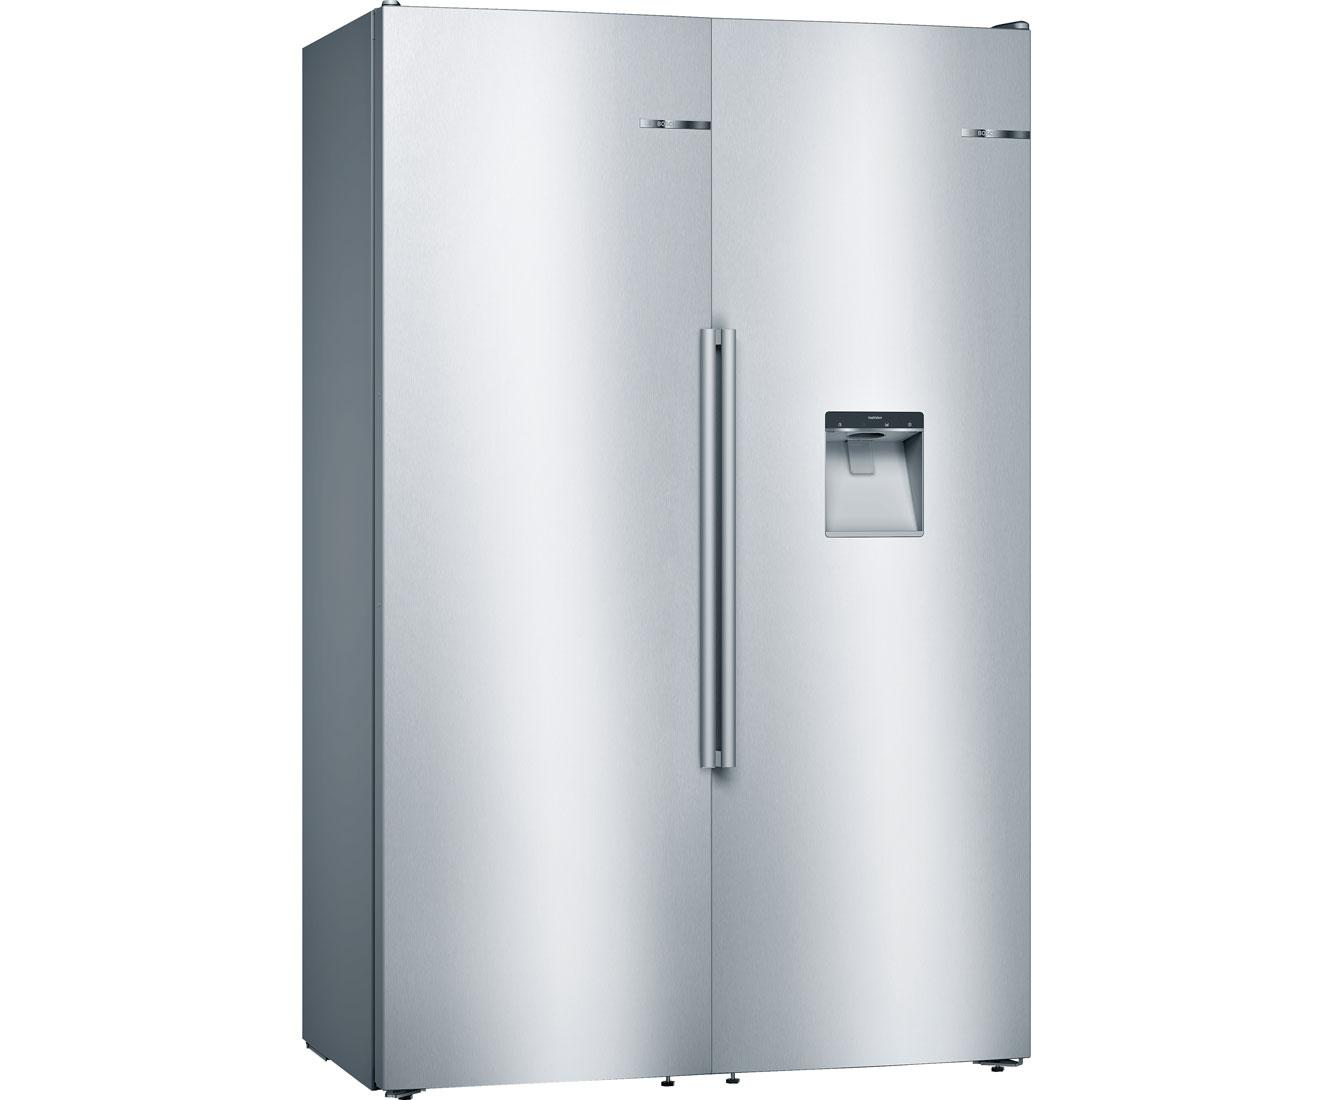 Side By Side Kühlschrank Leise : Rabatt preisvergleich haushalt u e kühlschränke u e side by side